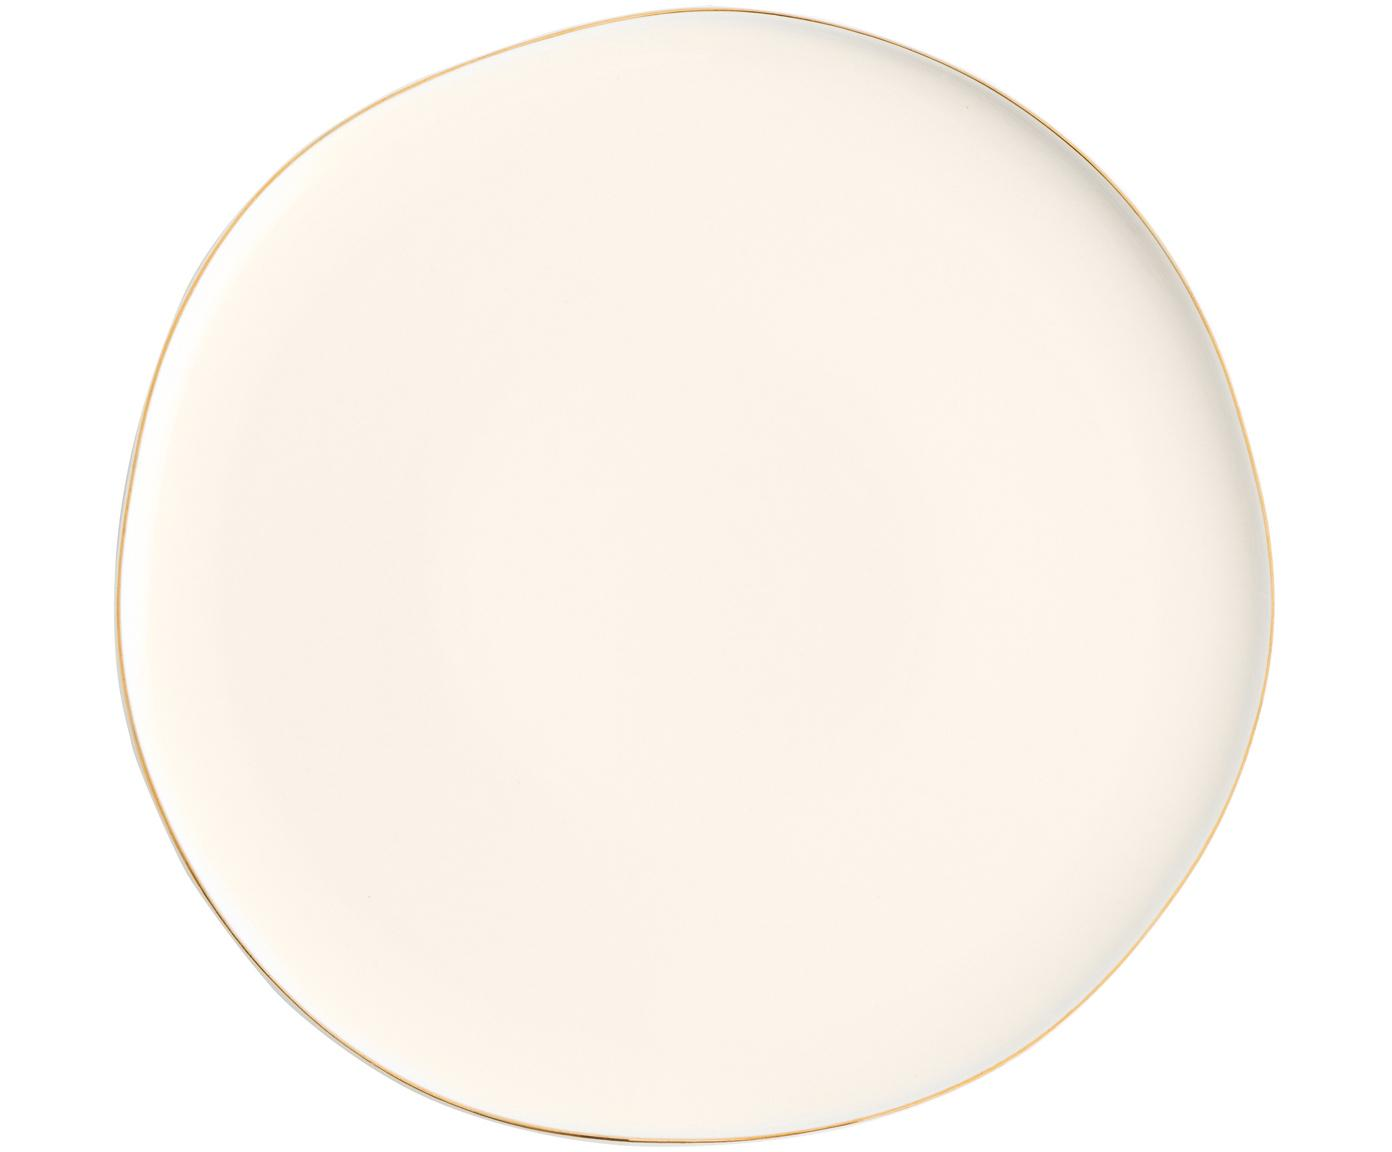 Dinerborden Pacifica, 2 stuks, Porselein, Wit. Rand: goudkleurig, Ø 26 cm